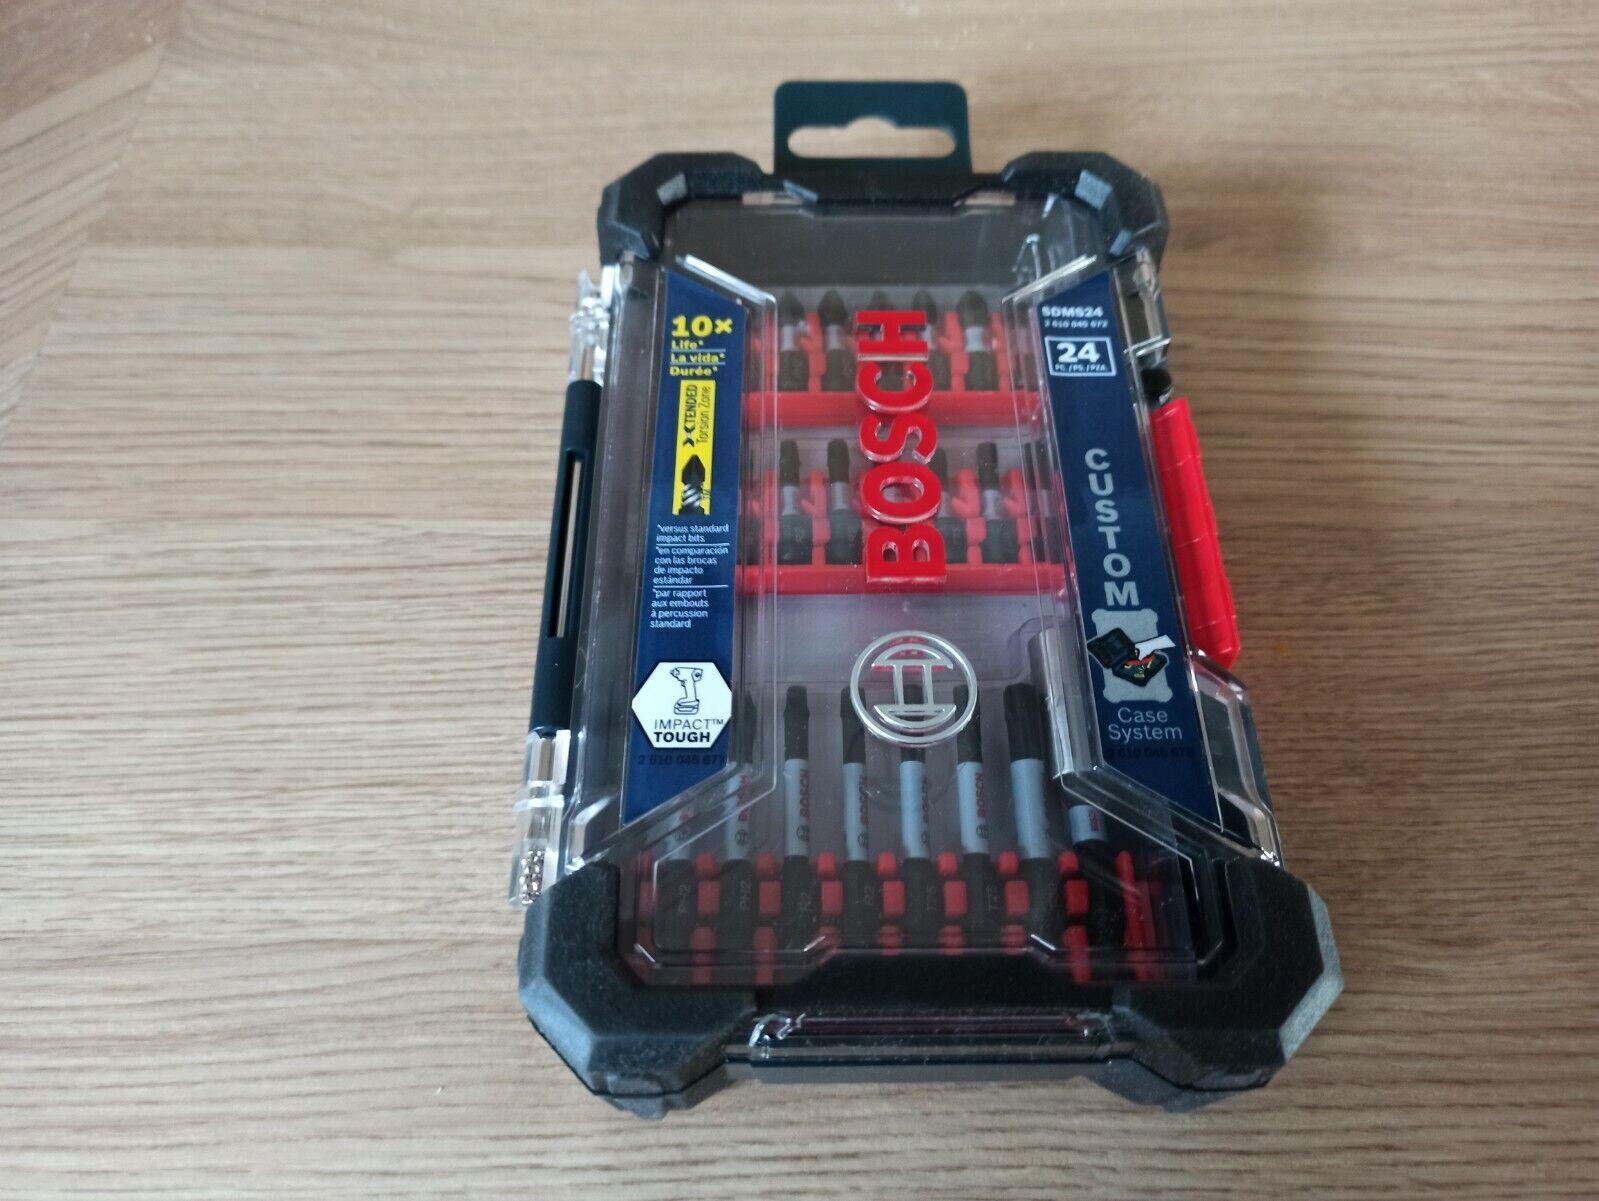 Set 24 Bosch Bit Neu SDMS24 - 24 Bit-Aufsätze mit Hardcase